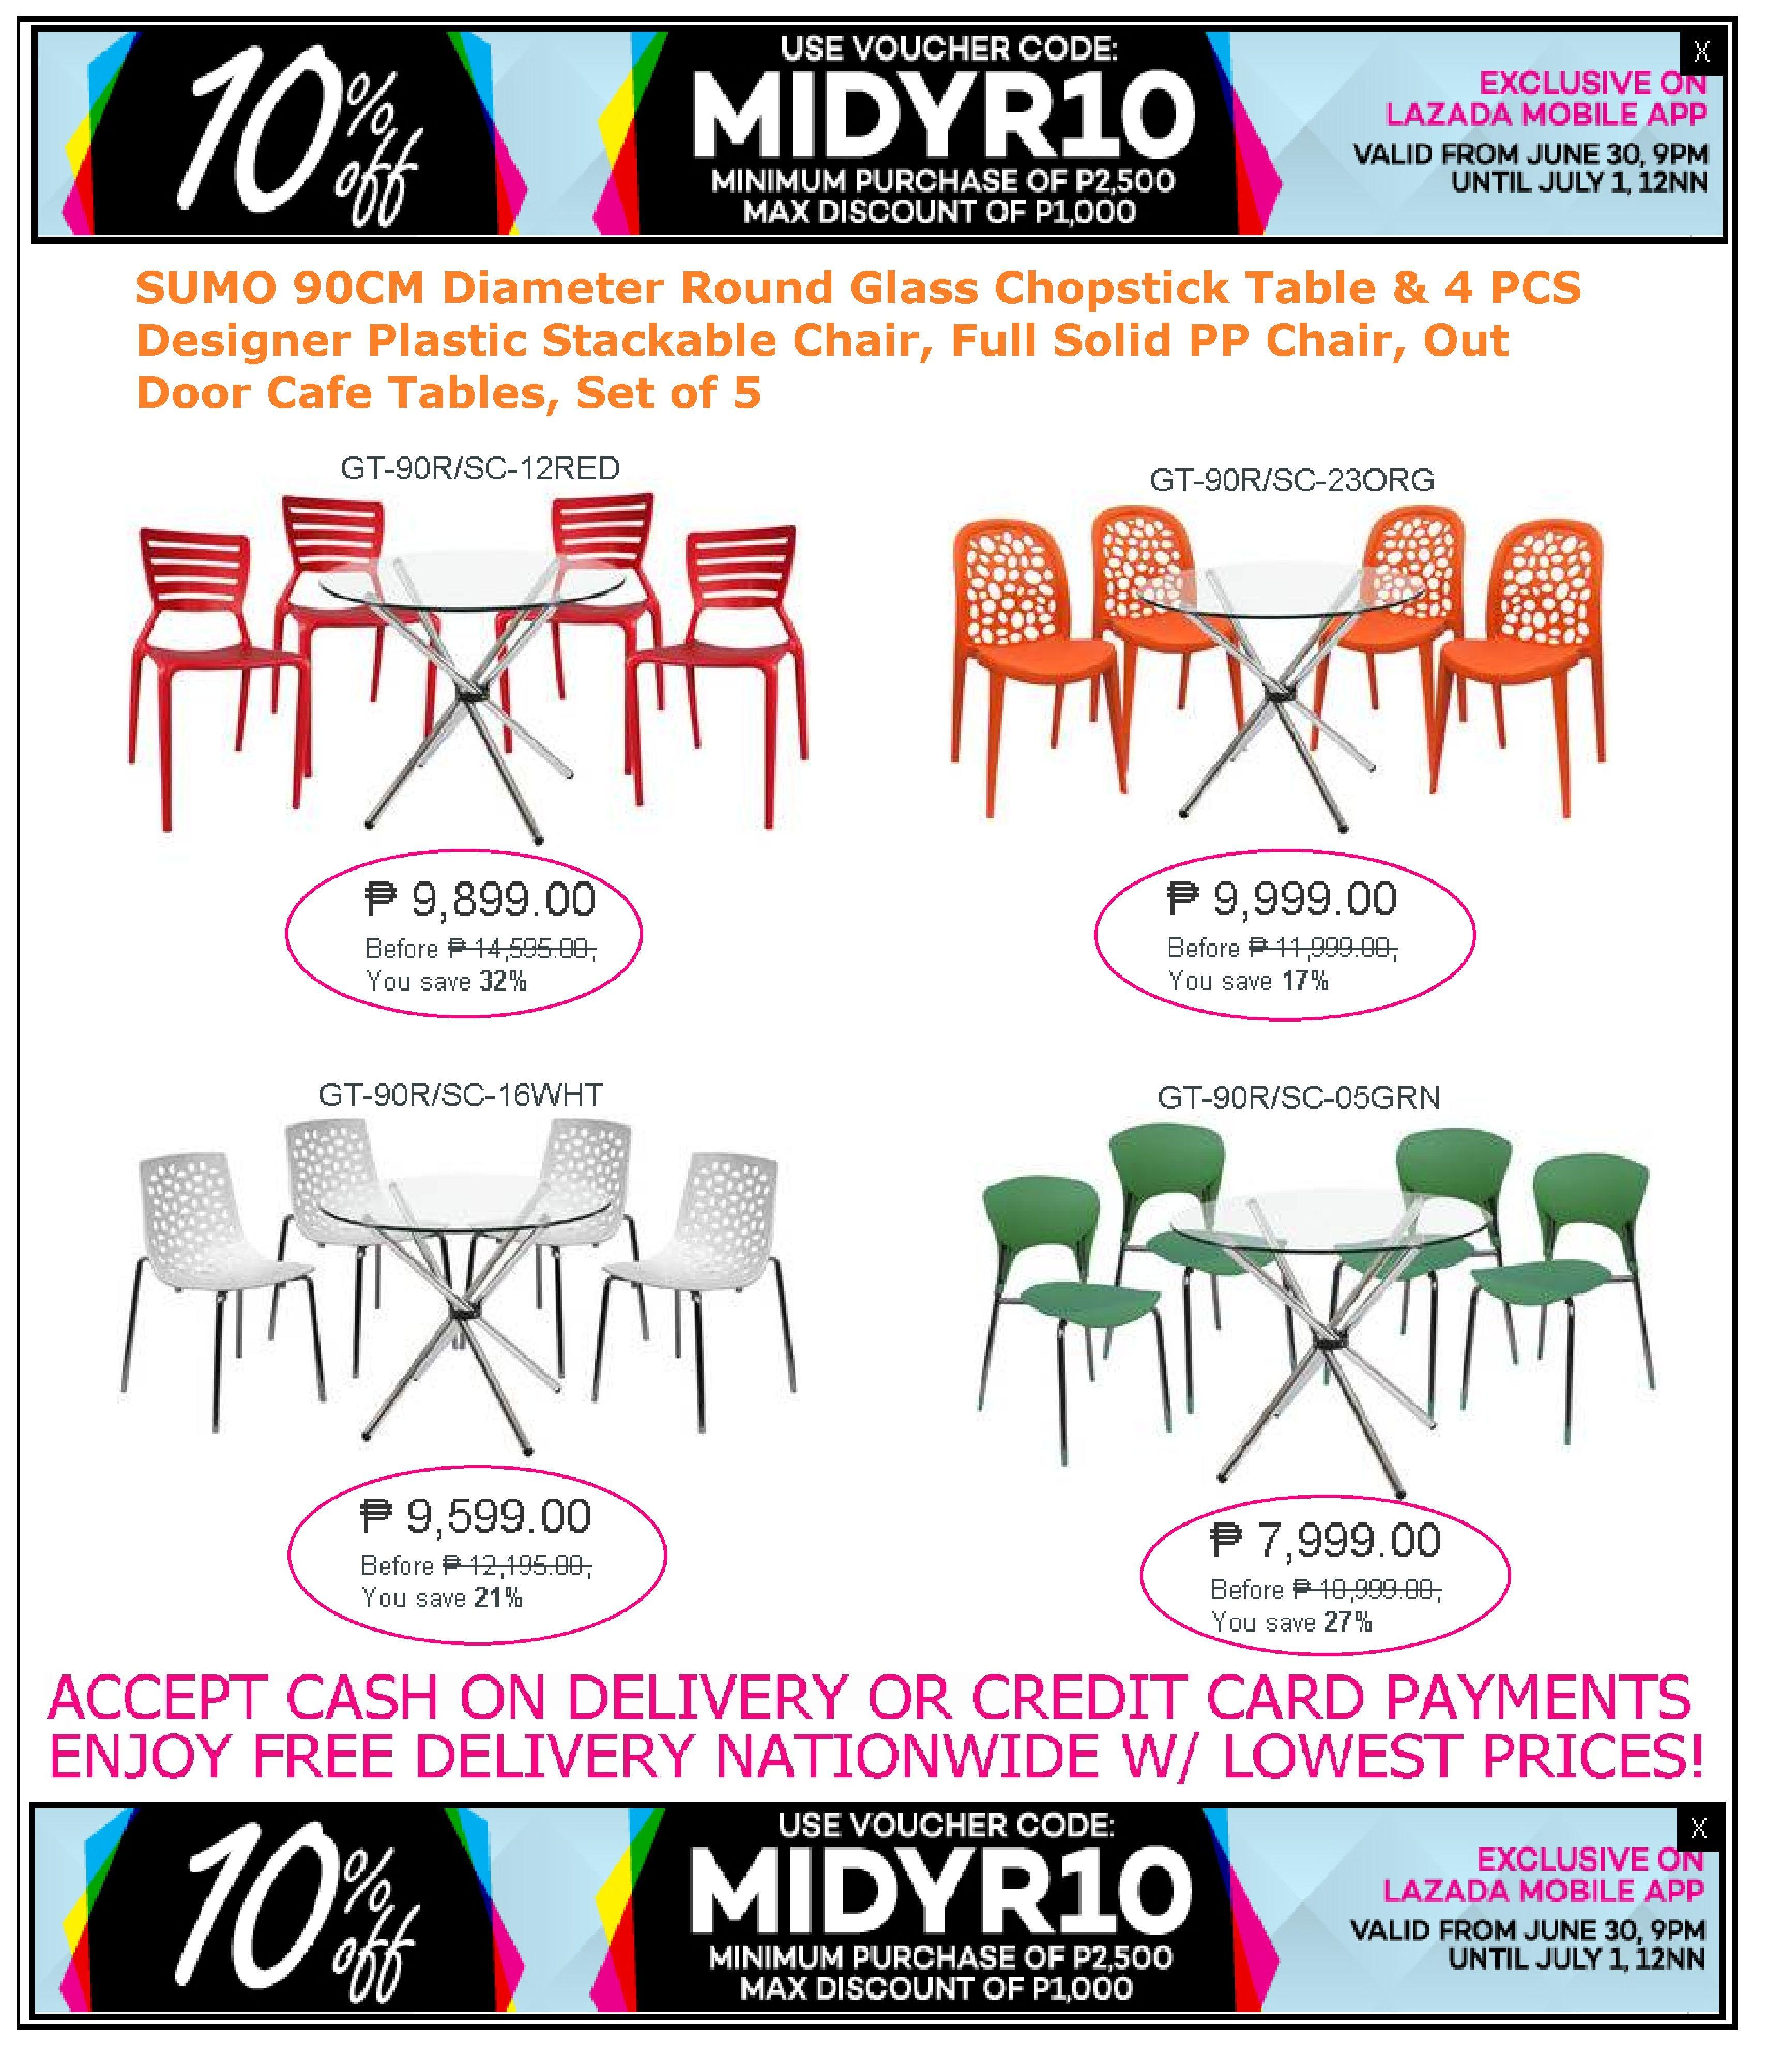 restaurant furniture sale lazada mid year promo take 10 off